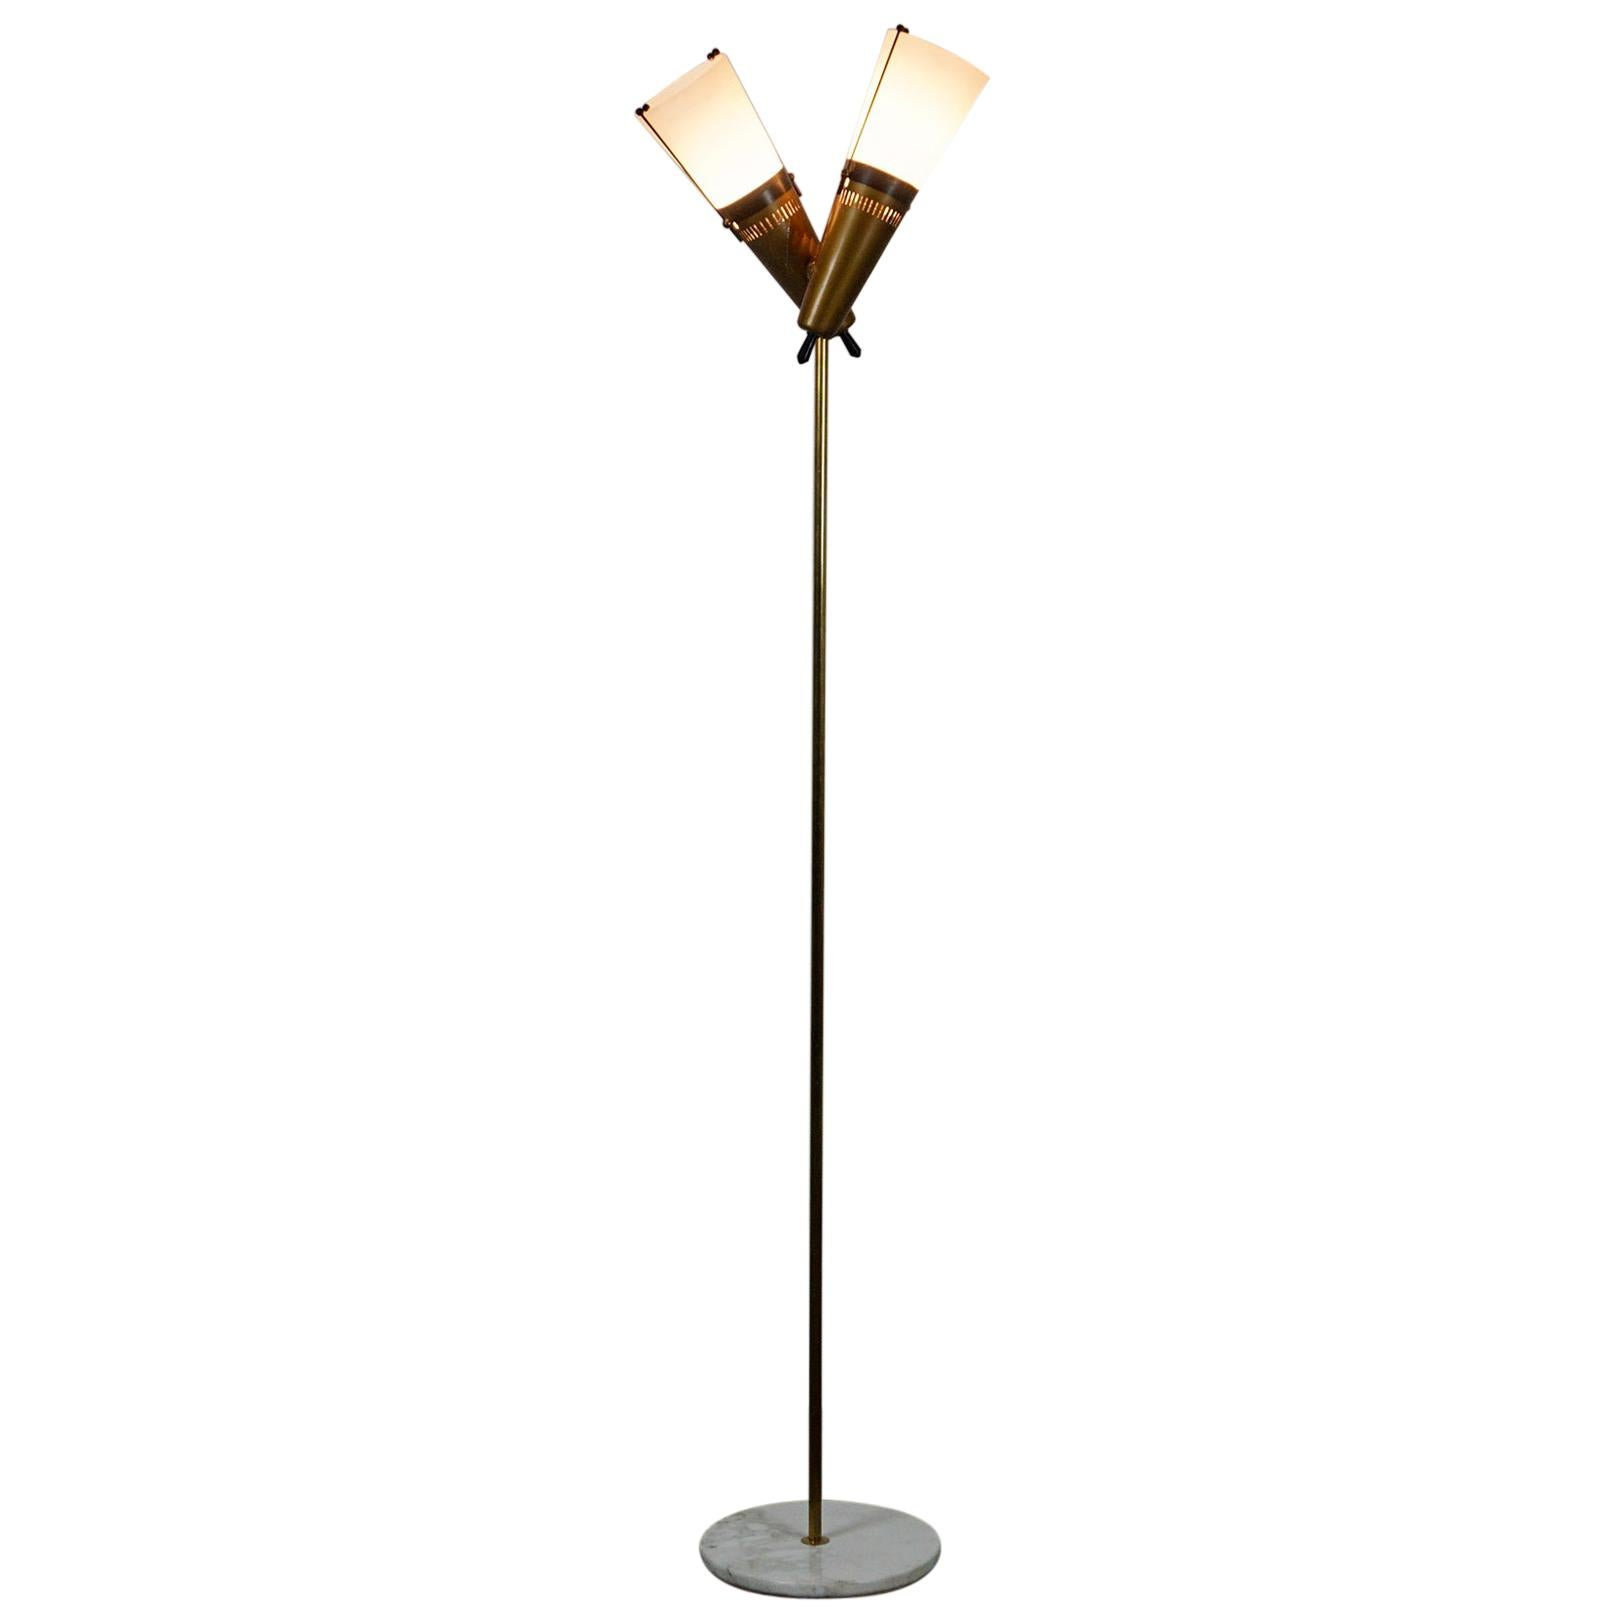 Italian Midcentury Brass, Glass and Marble Floor Lamp by Bruno Chiarini